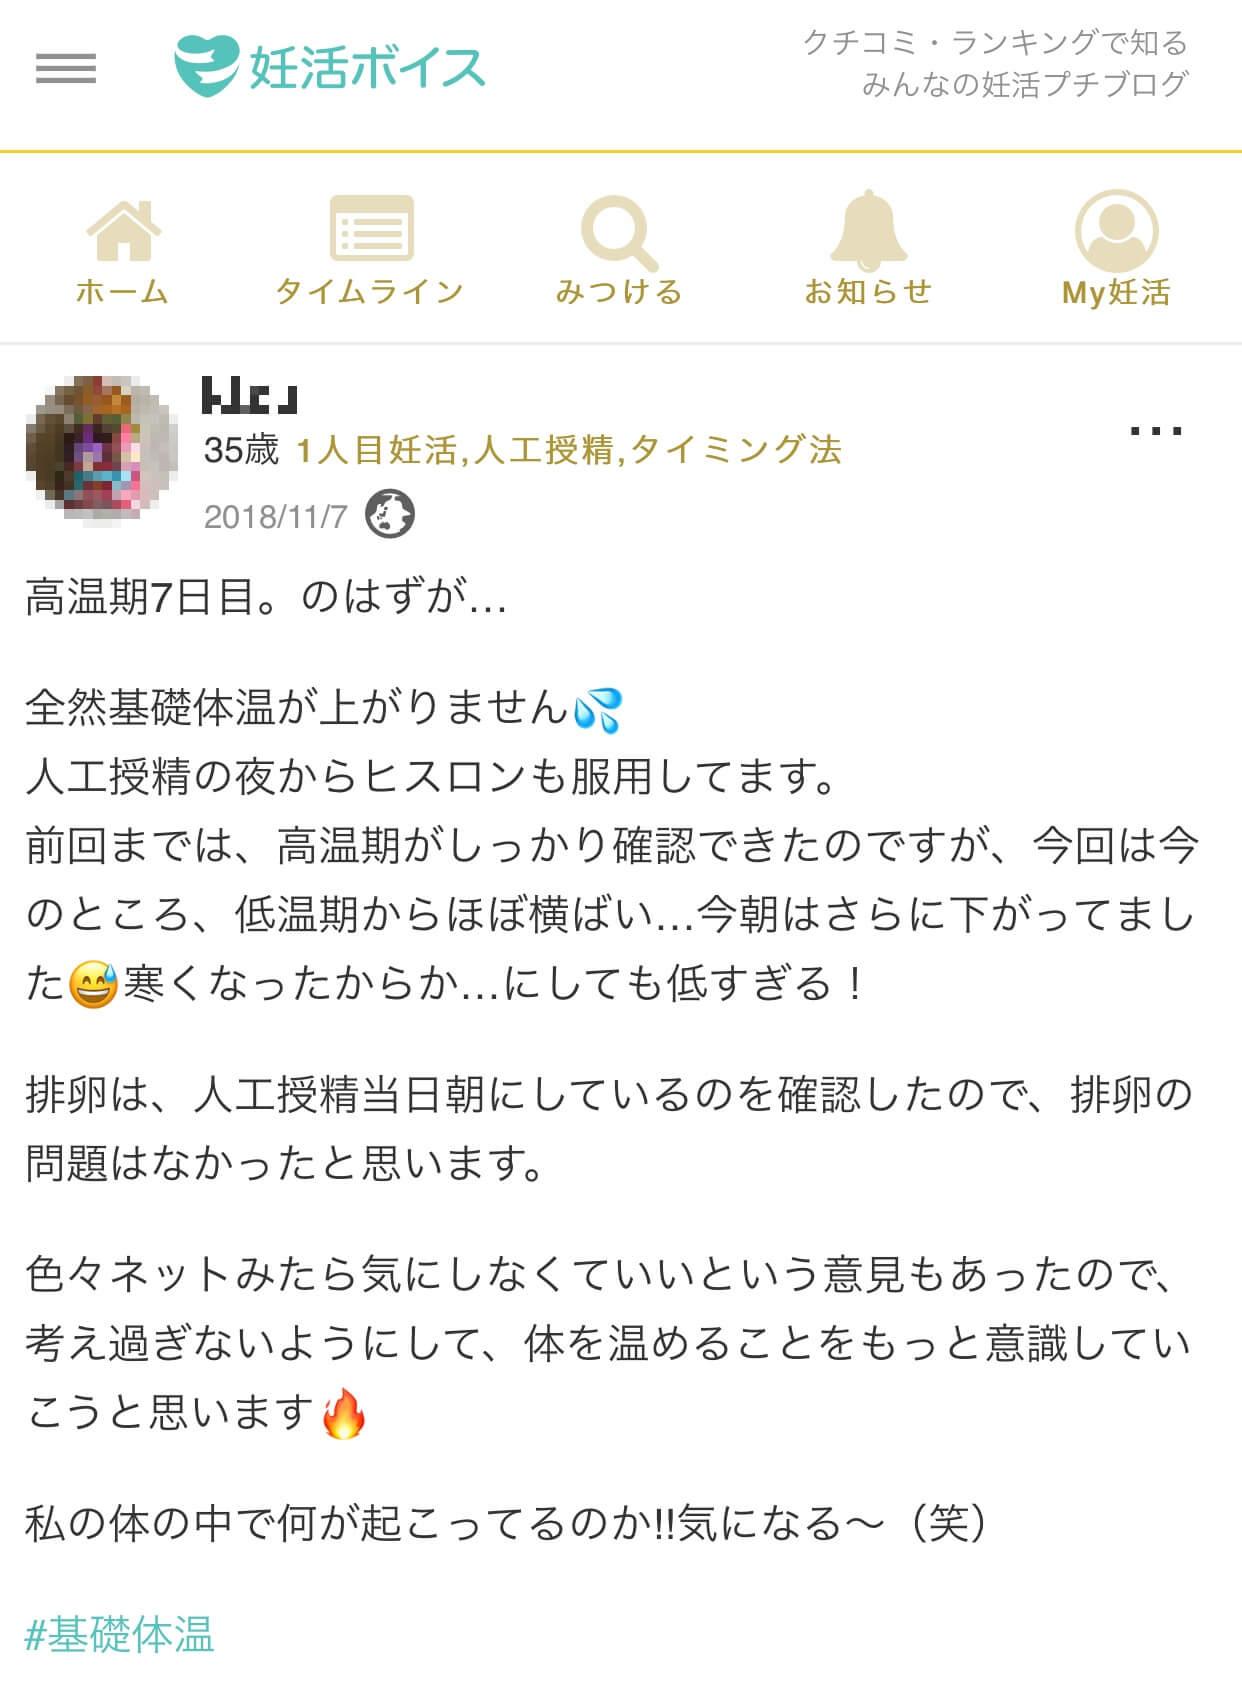 kさん(35歳・1人目妊活・タイミング法・人工授精)